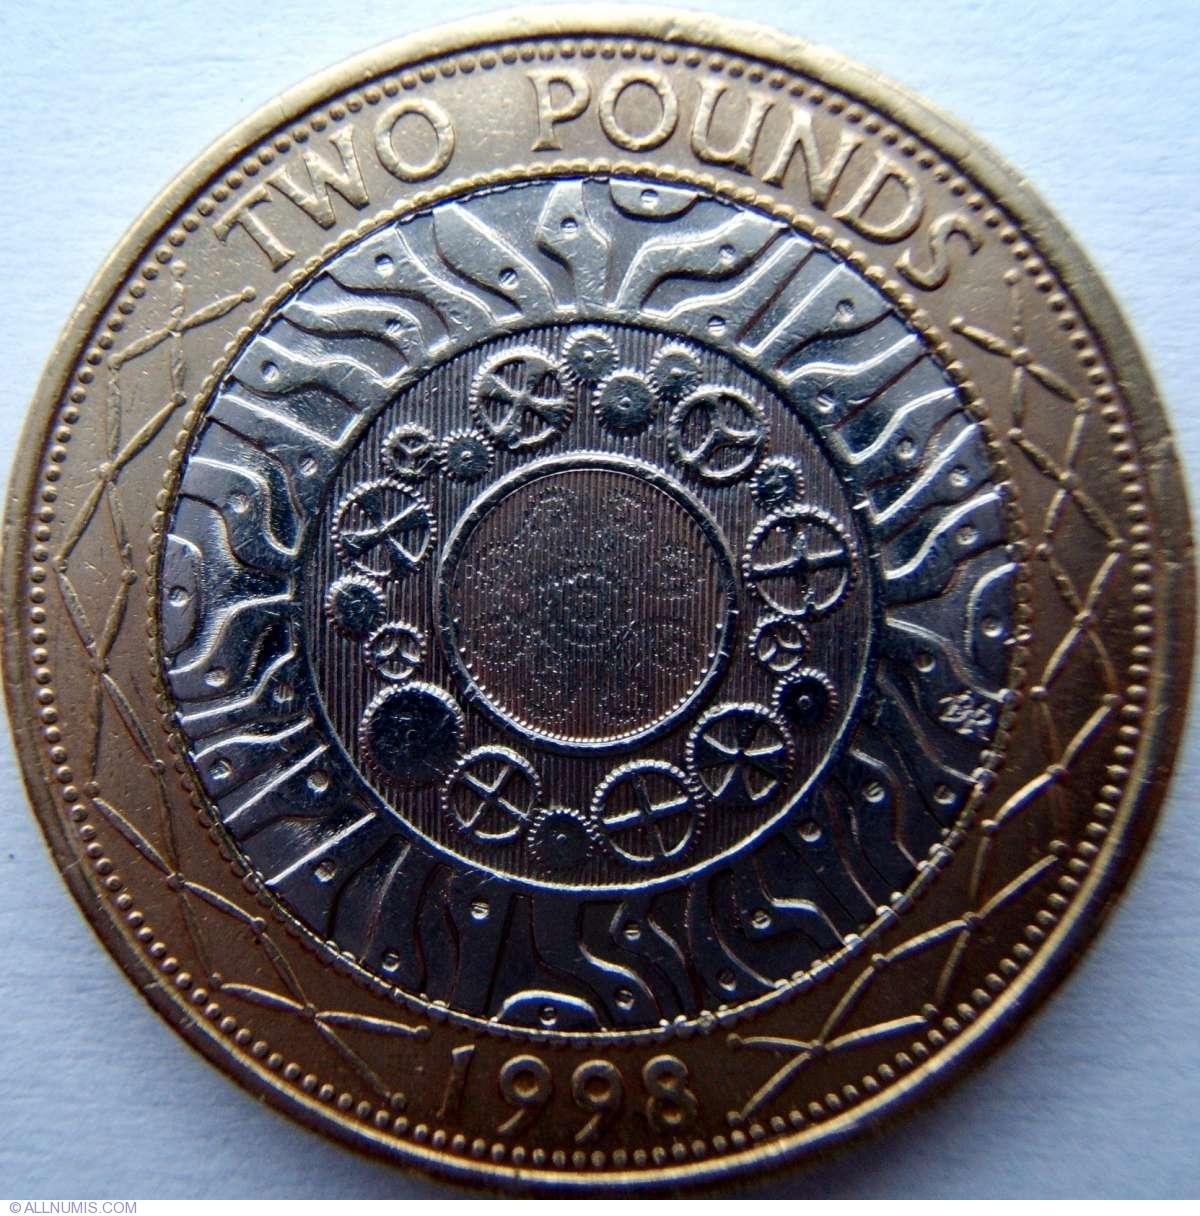 1 Pound Silver Coin Price